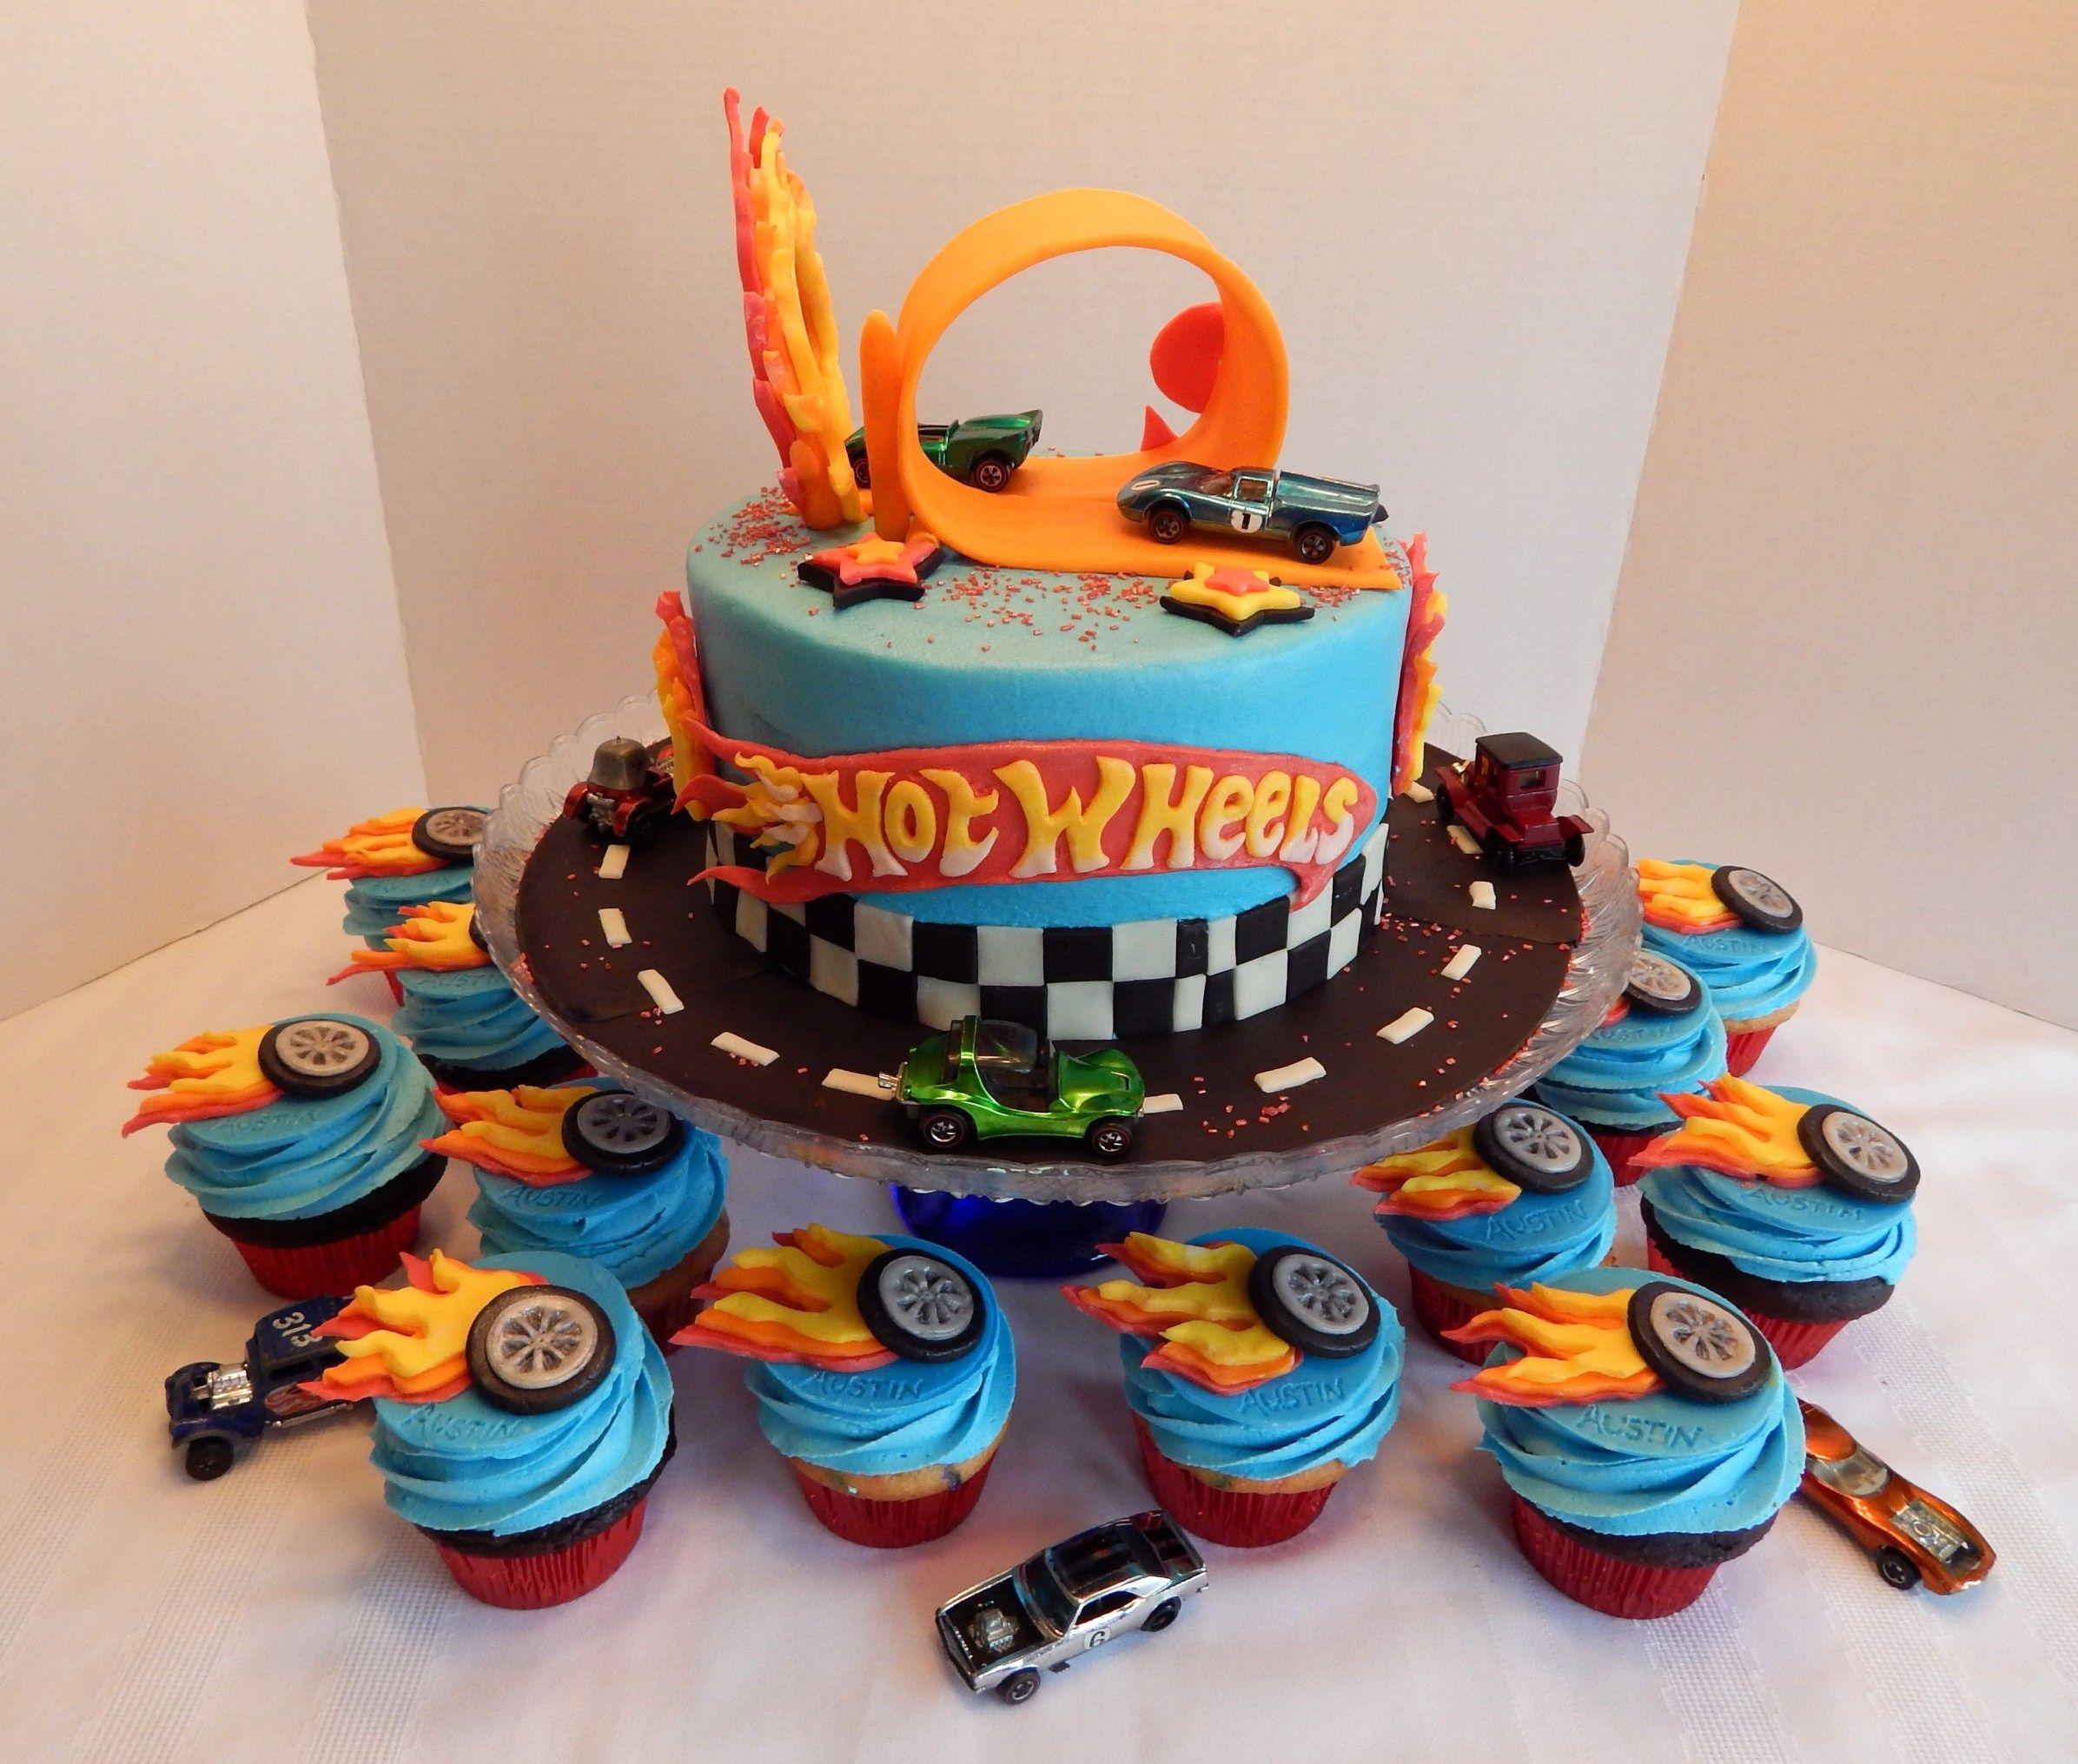 32 Great Image Of Hot Wheels Birthday Cake Hot Wheels Birthday